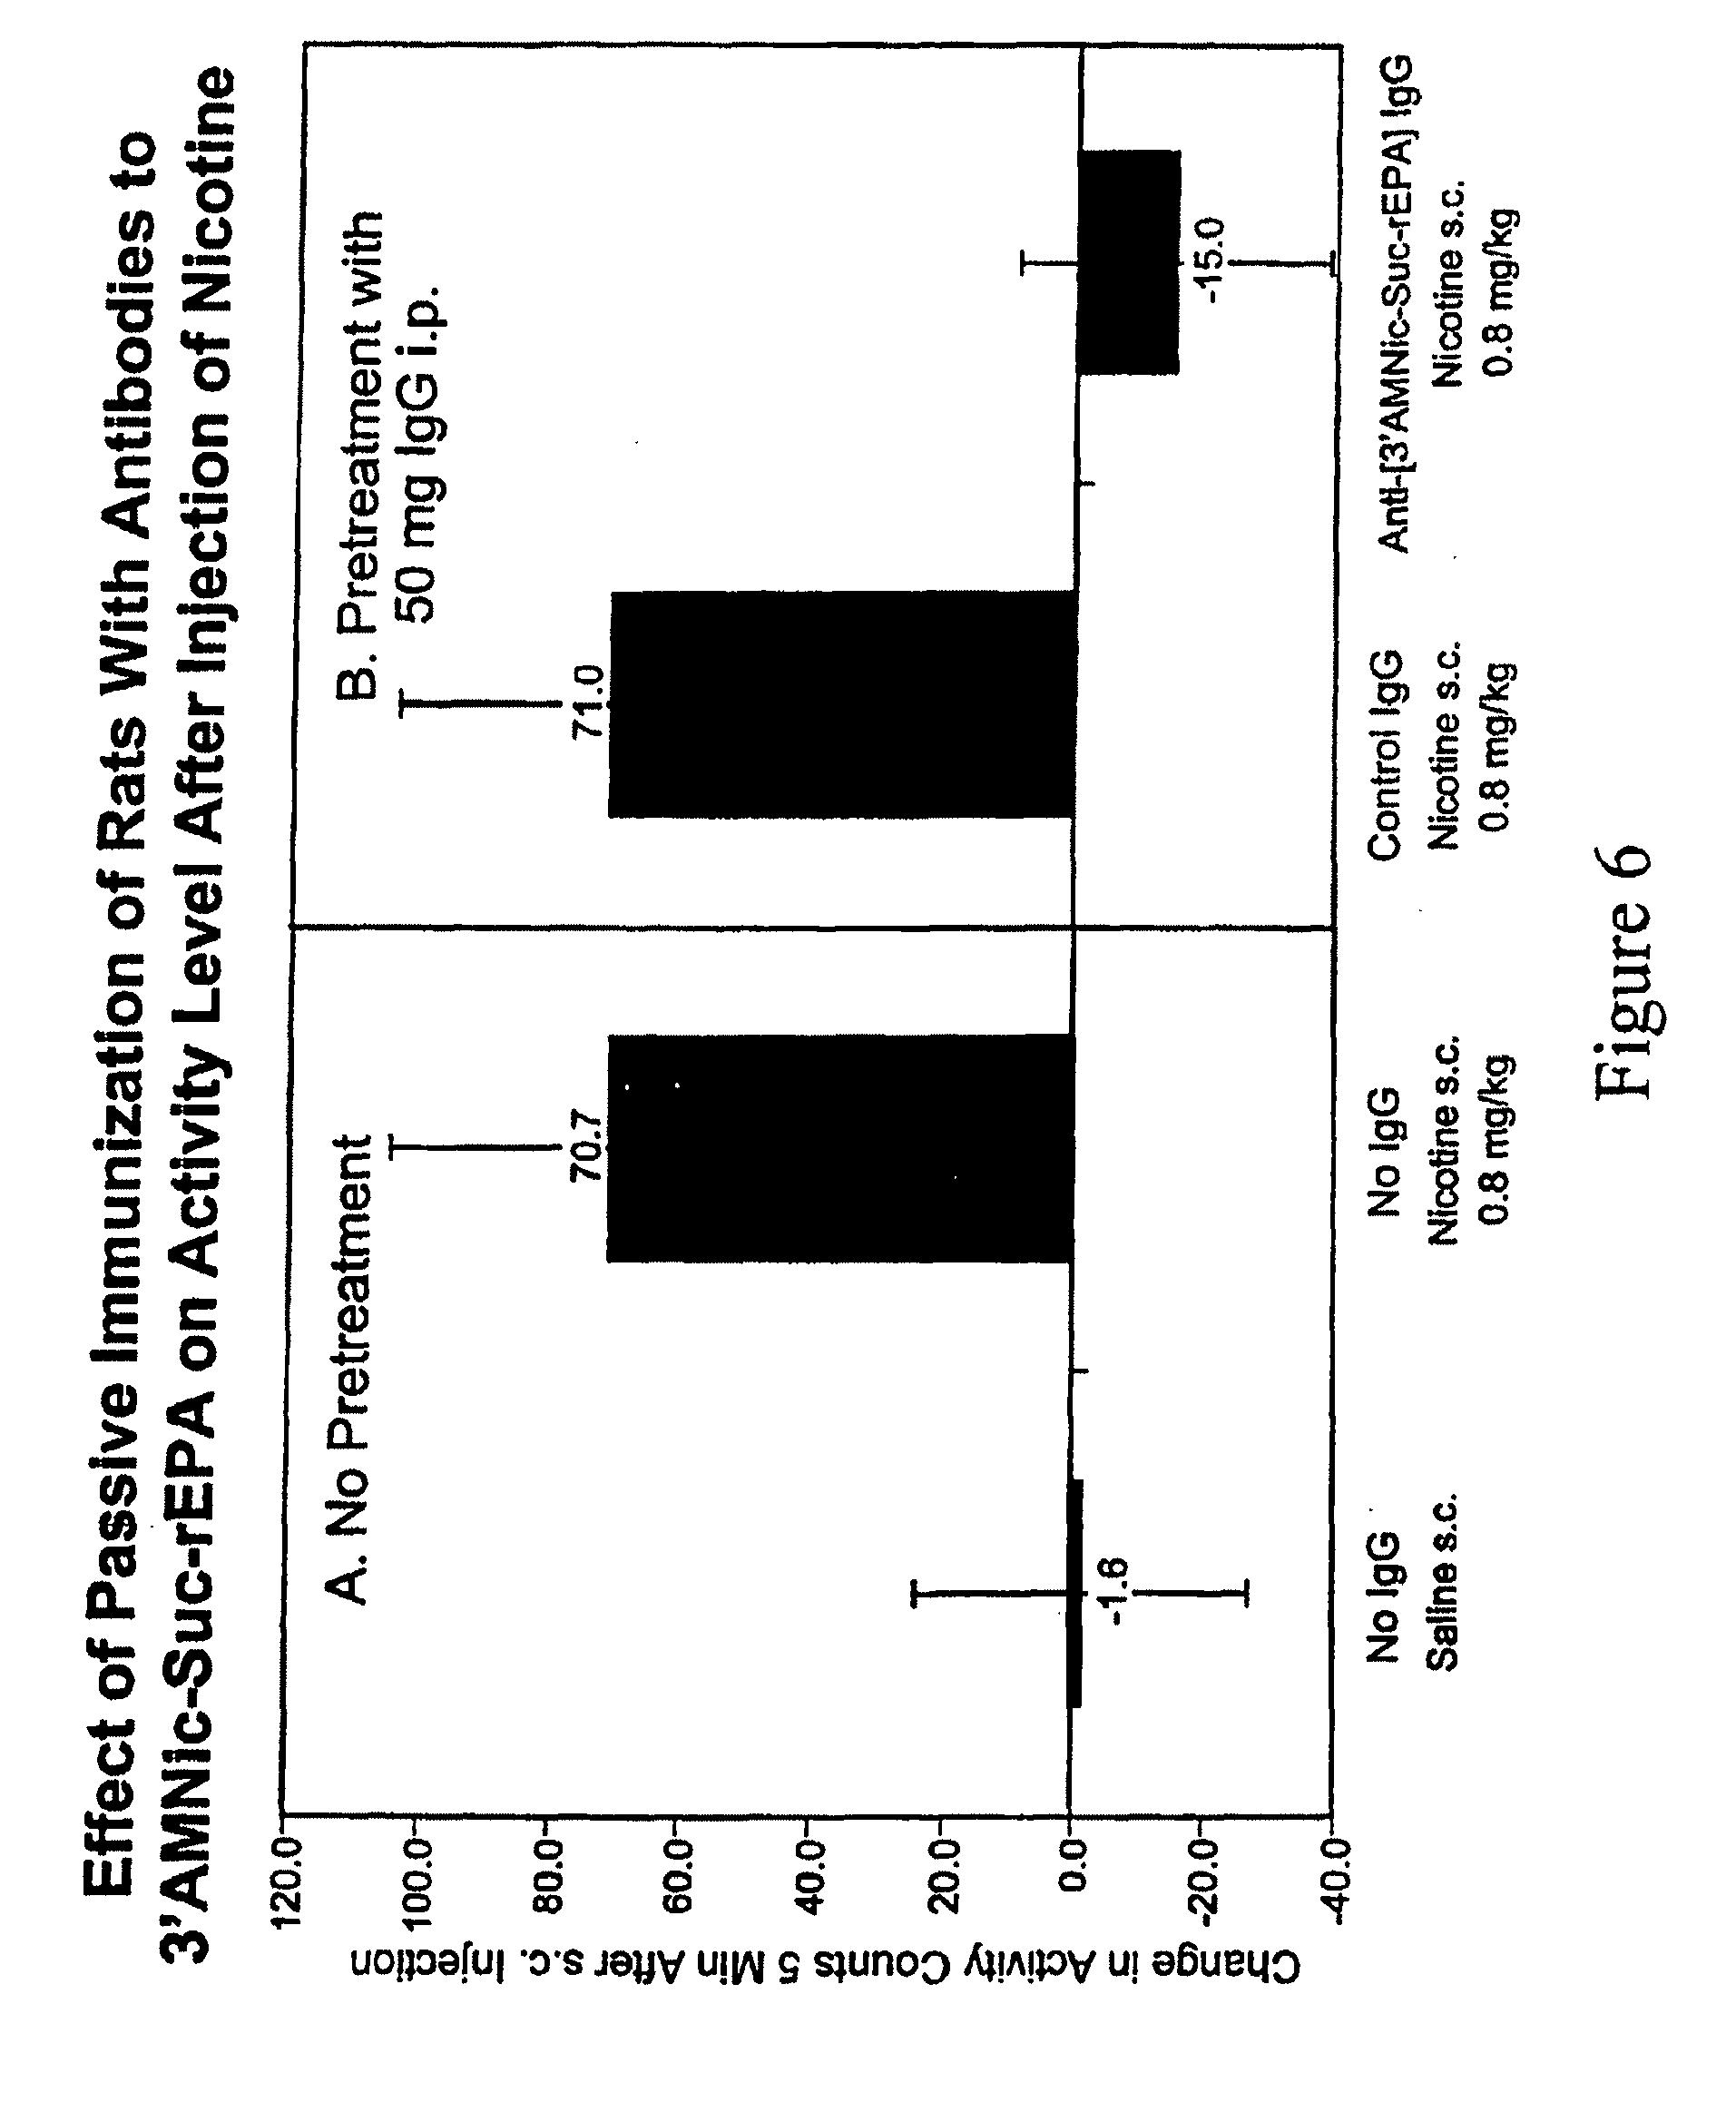 immulogic pharmaceutical corporation Waltham, mass, oct 1, 1996 /prnewswire/ via individual inc -- immulogic pharmaceutical corporation (nasdaq: imul) today reported in nature medicine new research.